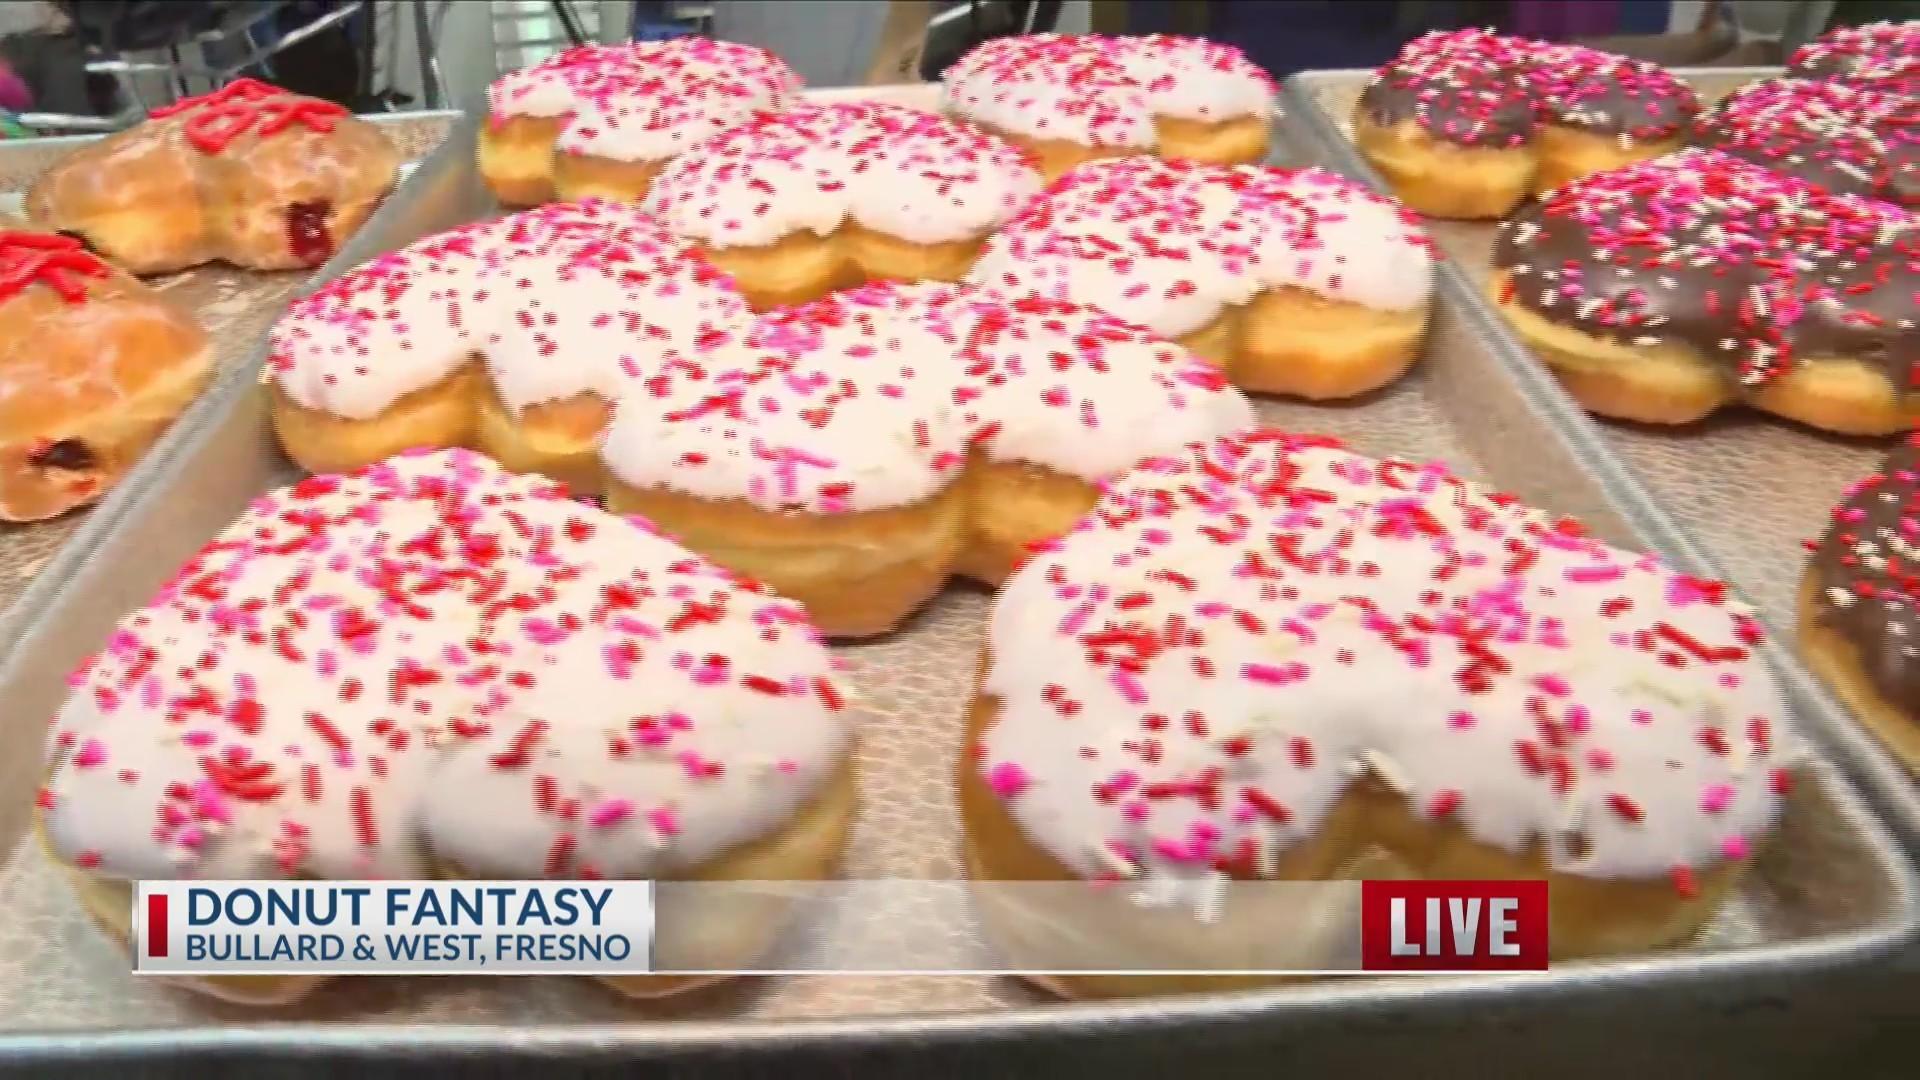 Donut Fantasy serving up heart-shaped donuts